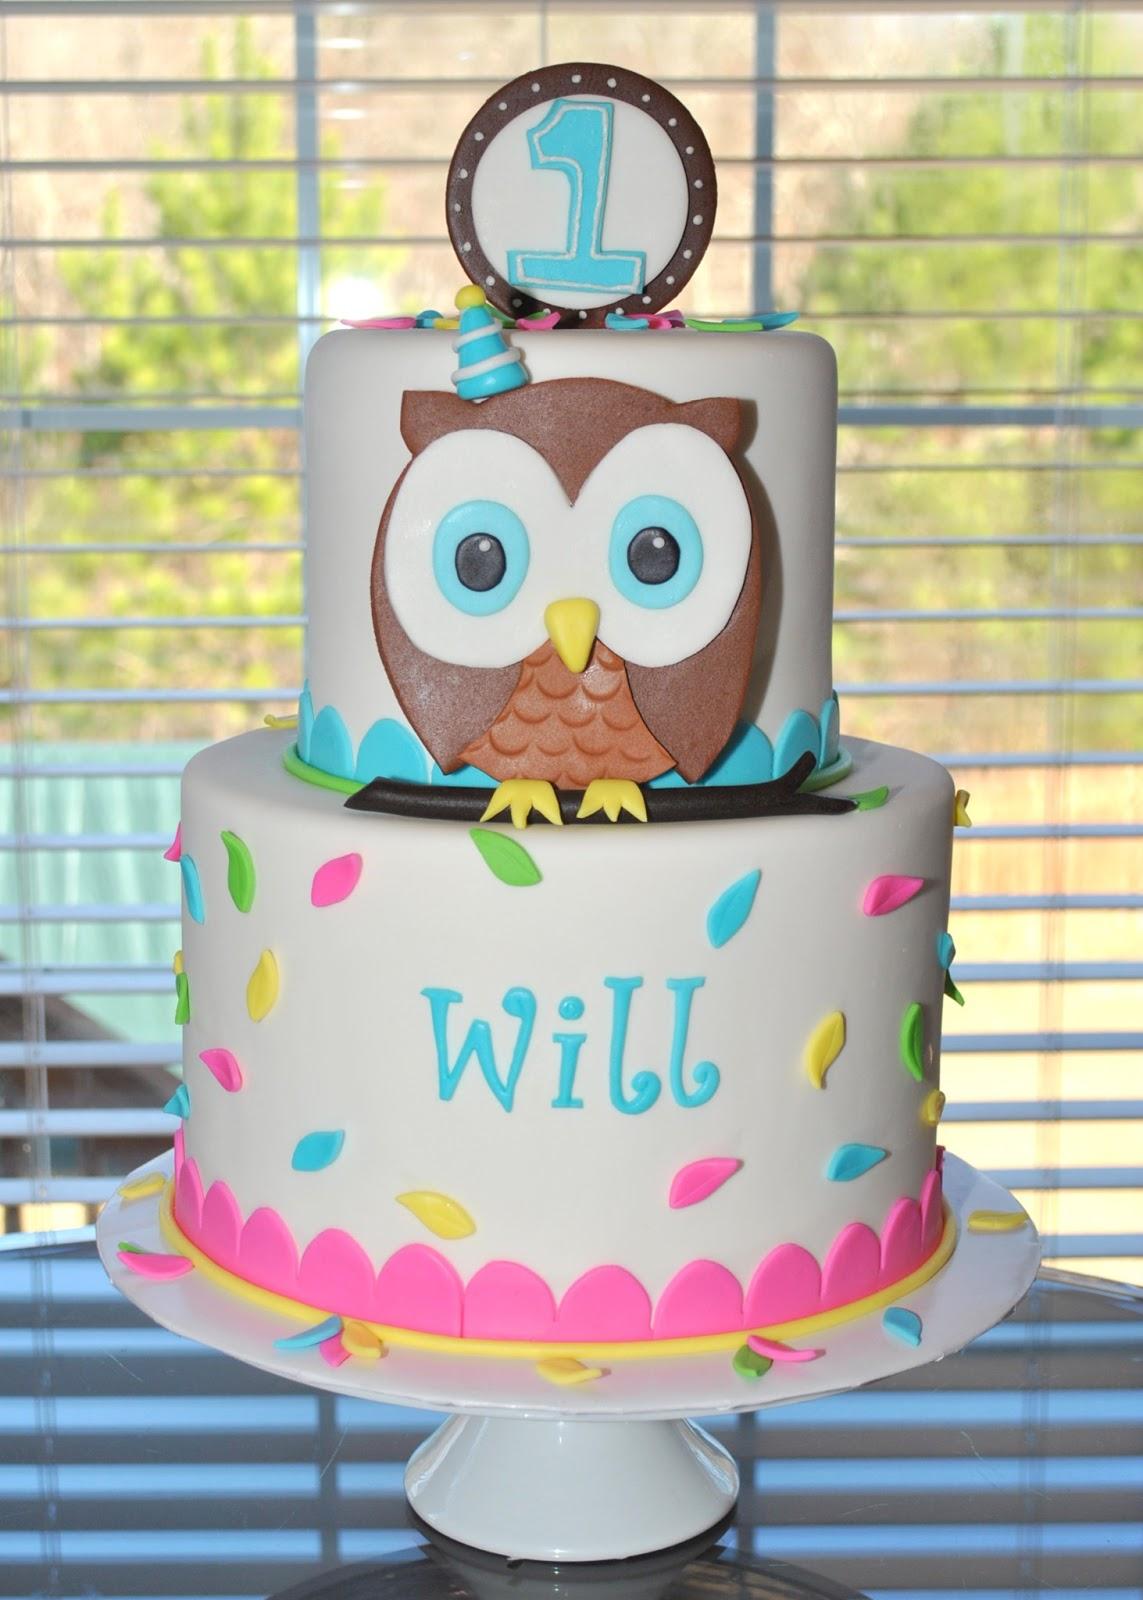 ark how to make sweet cake